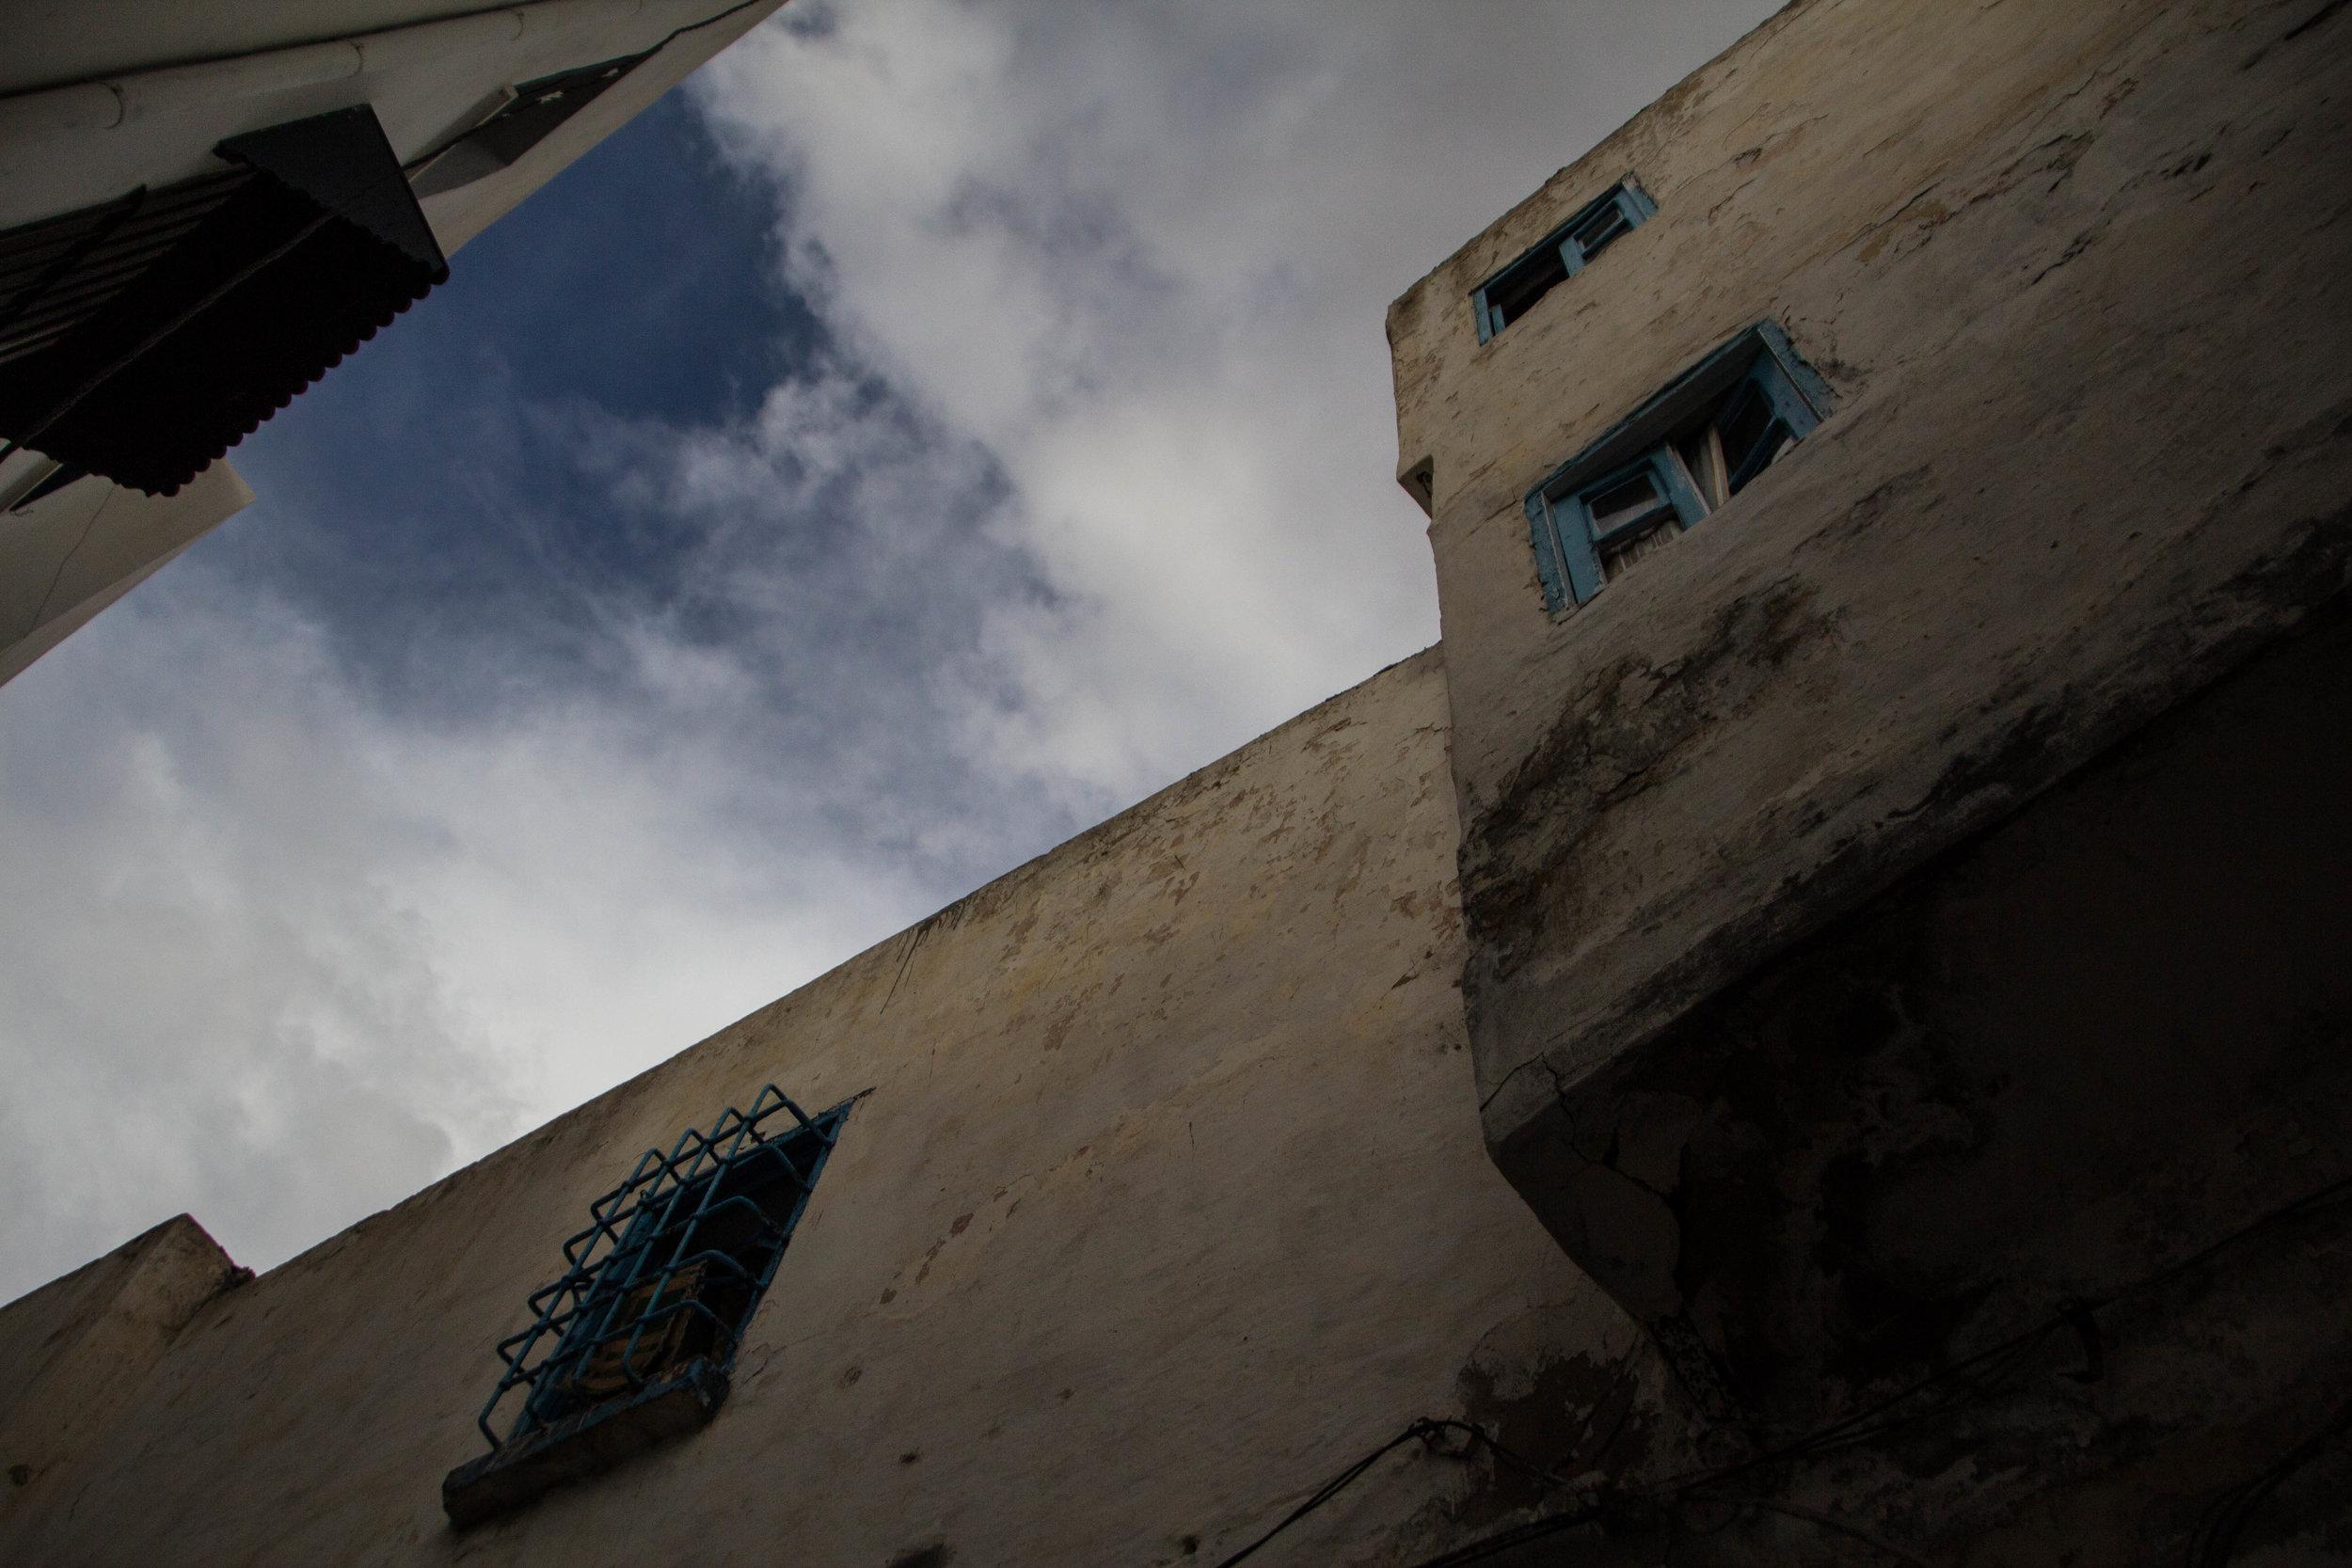 medina-photography-tunis-tunisia-9.jpg